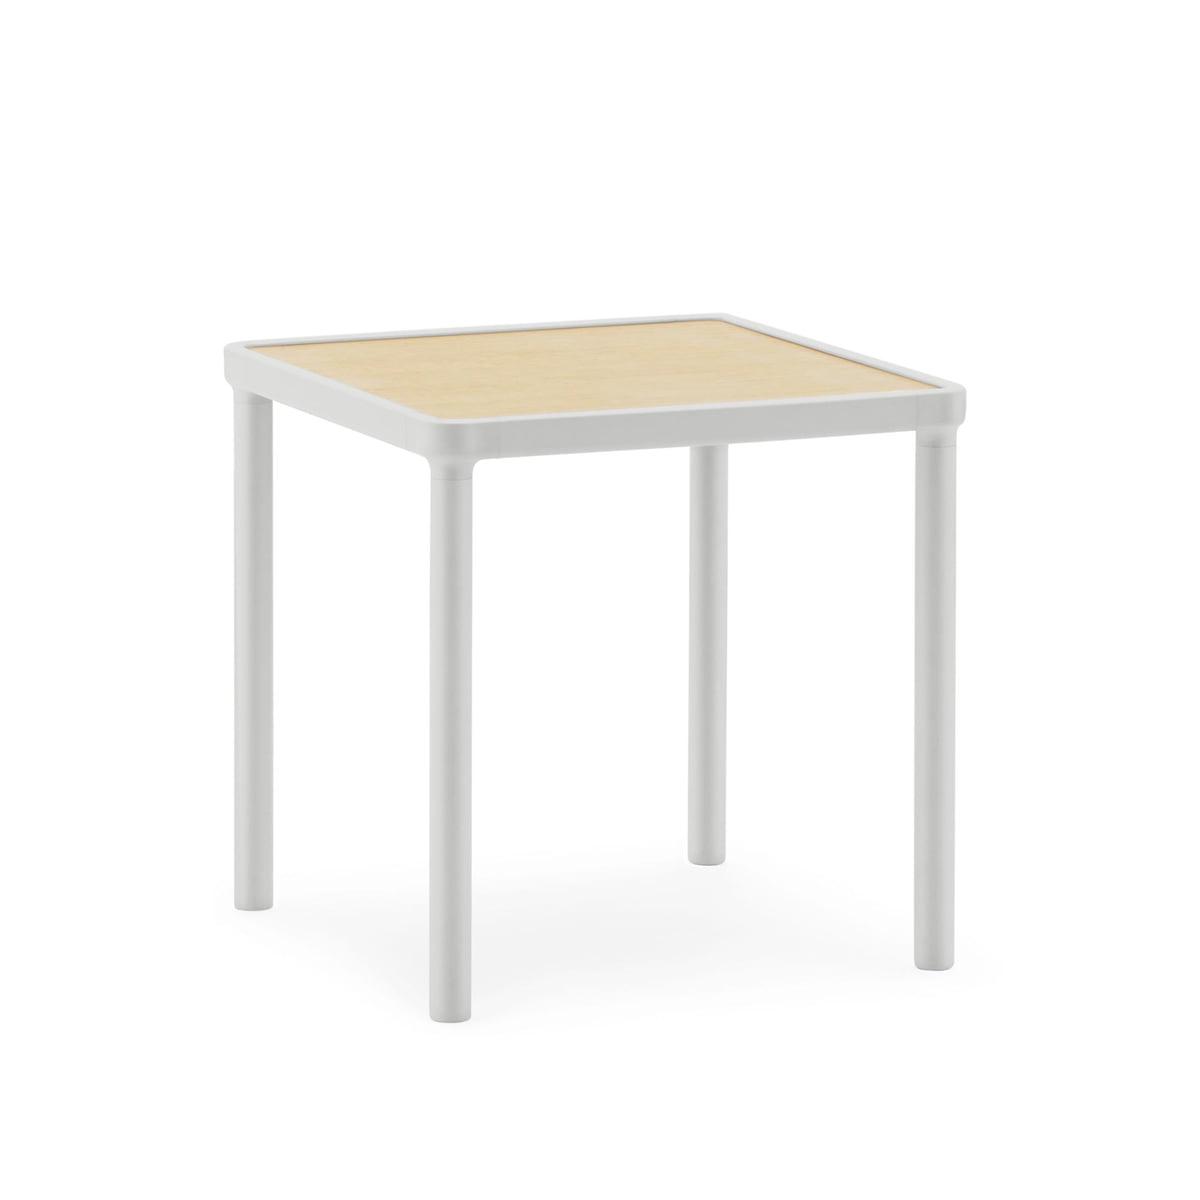 Case coffee table small 40 x 40 cm by normann copenhagen for Table exterieur 40 cm